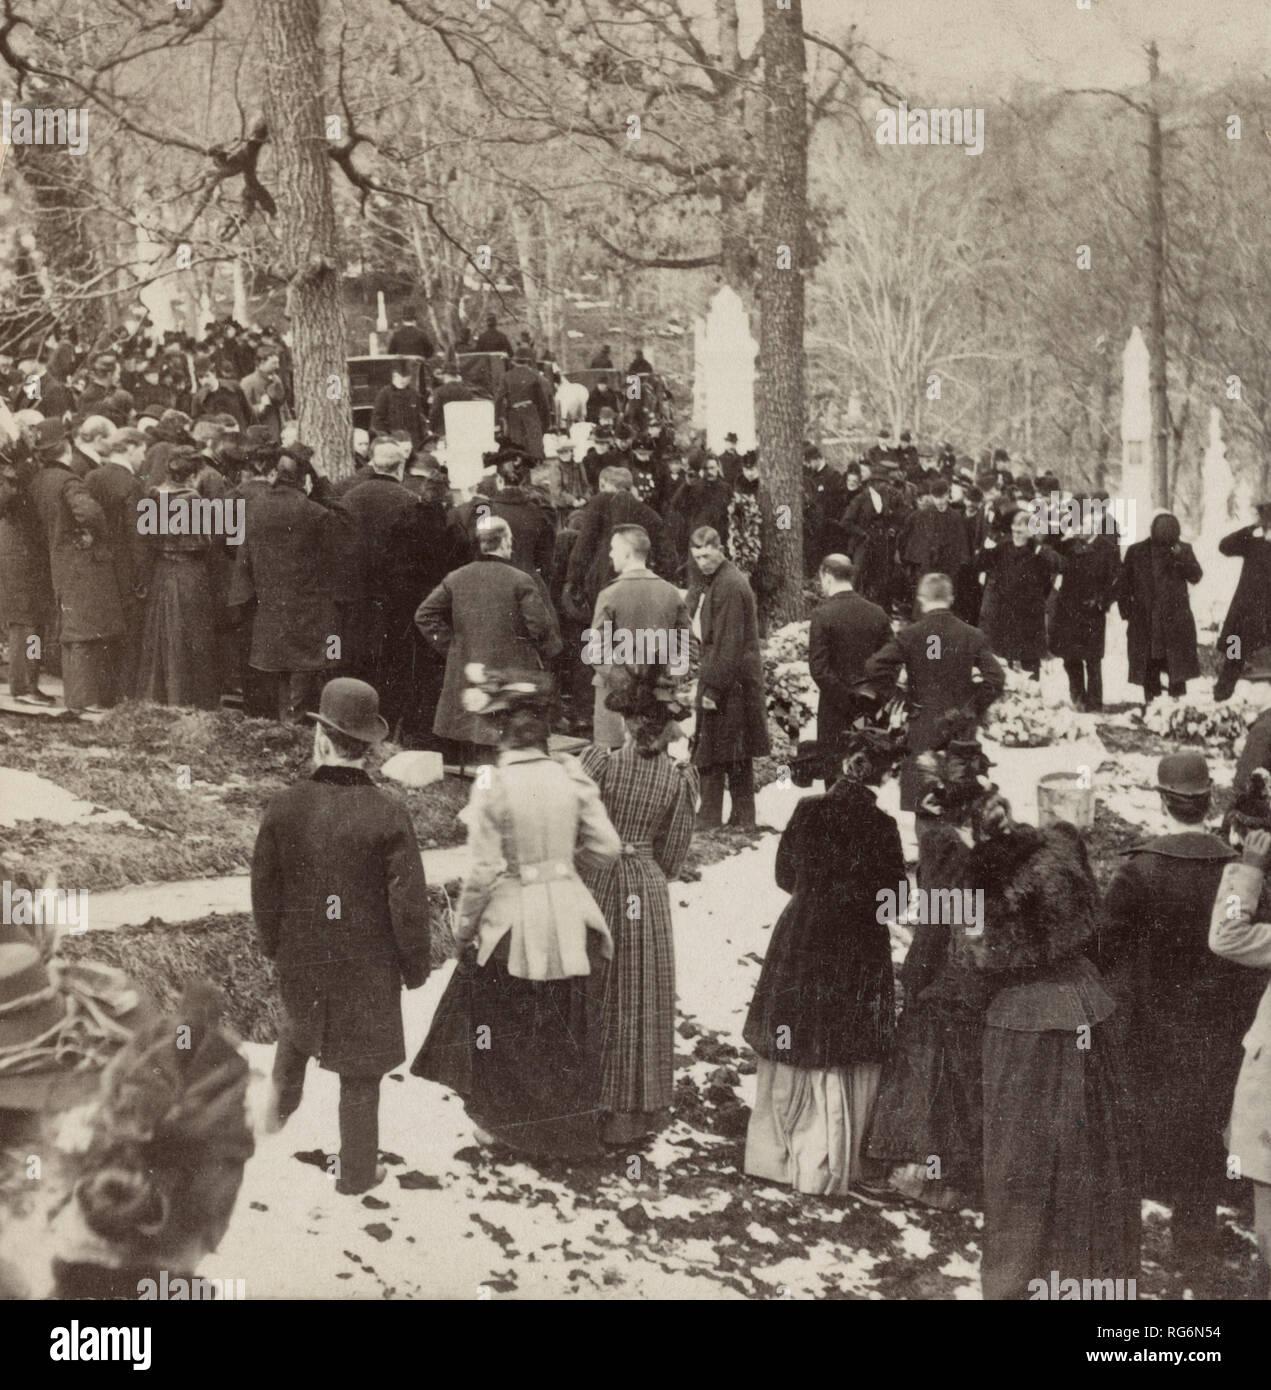 Ceremonies at the grave of James G. Blaine, Oak Hill Washington, D.C., USA - 1893 - Stock Image